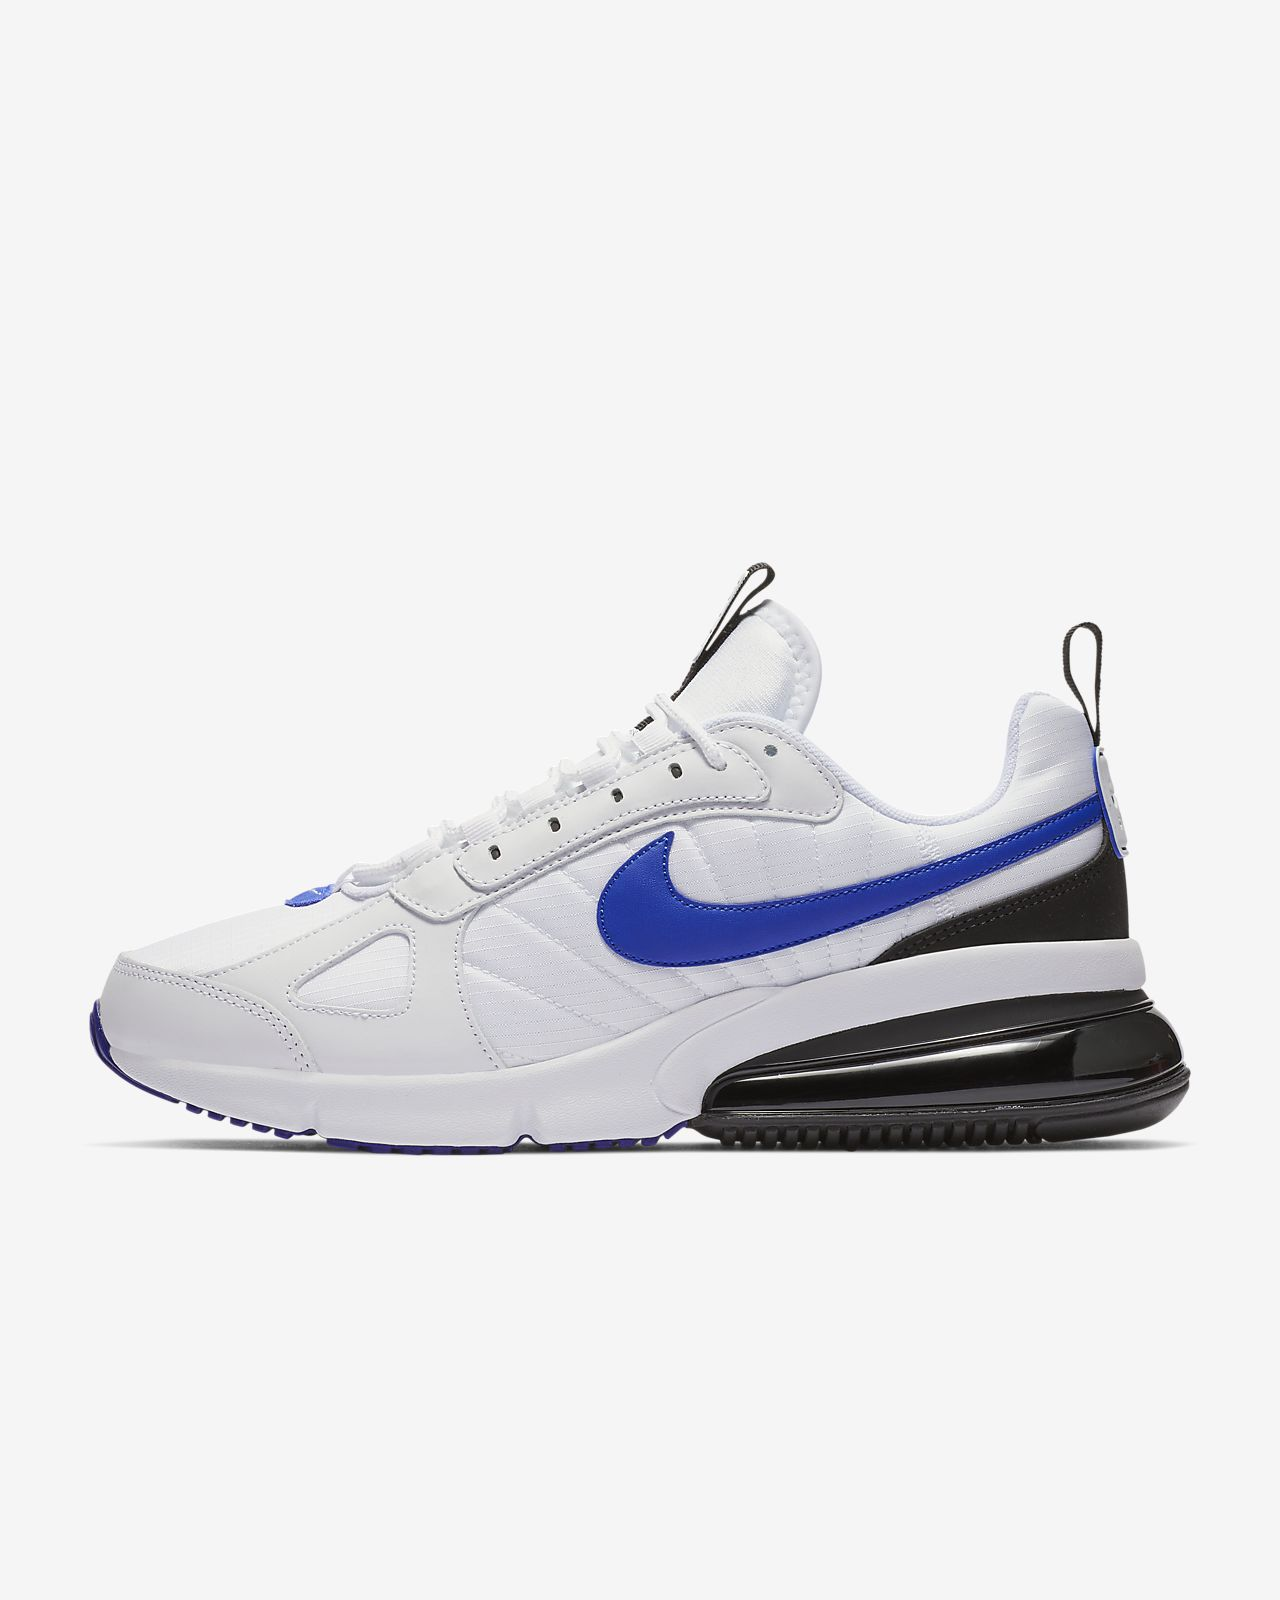 Nike Air Max 270 Futura Zapatillas - Hombre